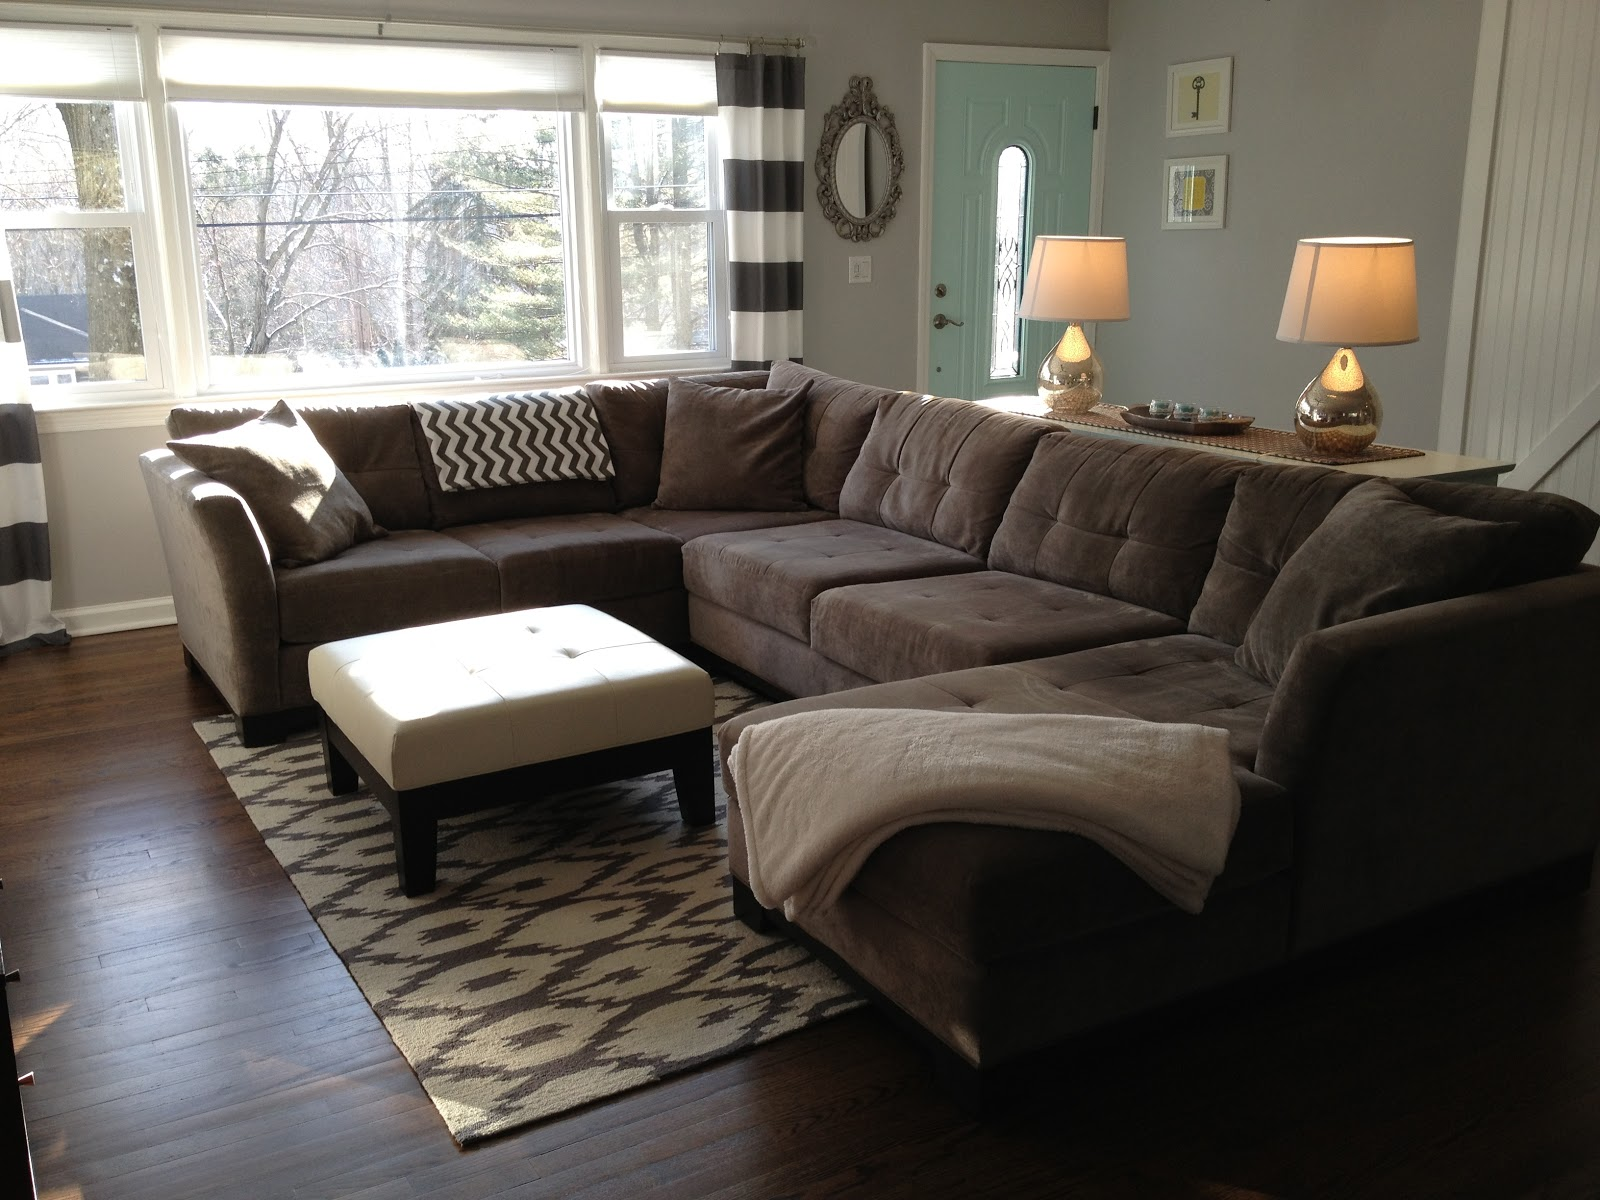 sofa rug arrangement signature design by ashley furniture hannin queen sleeper in lagoon retro ranch reno rugs revealed